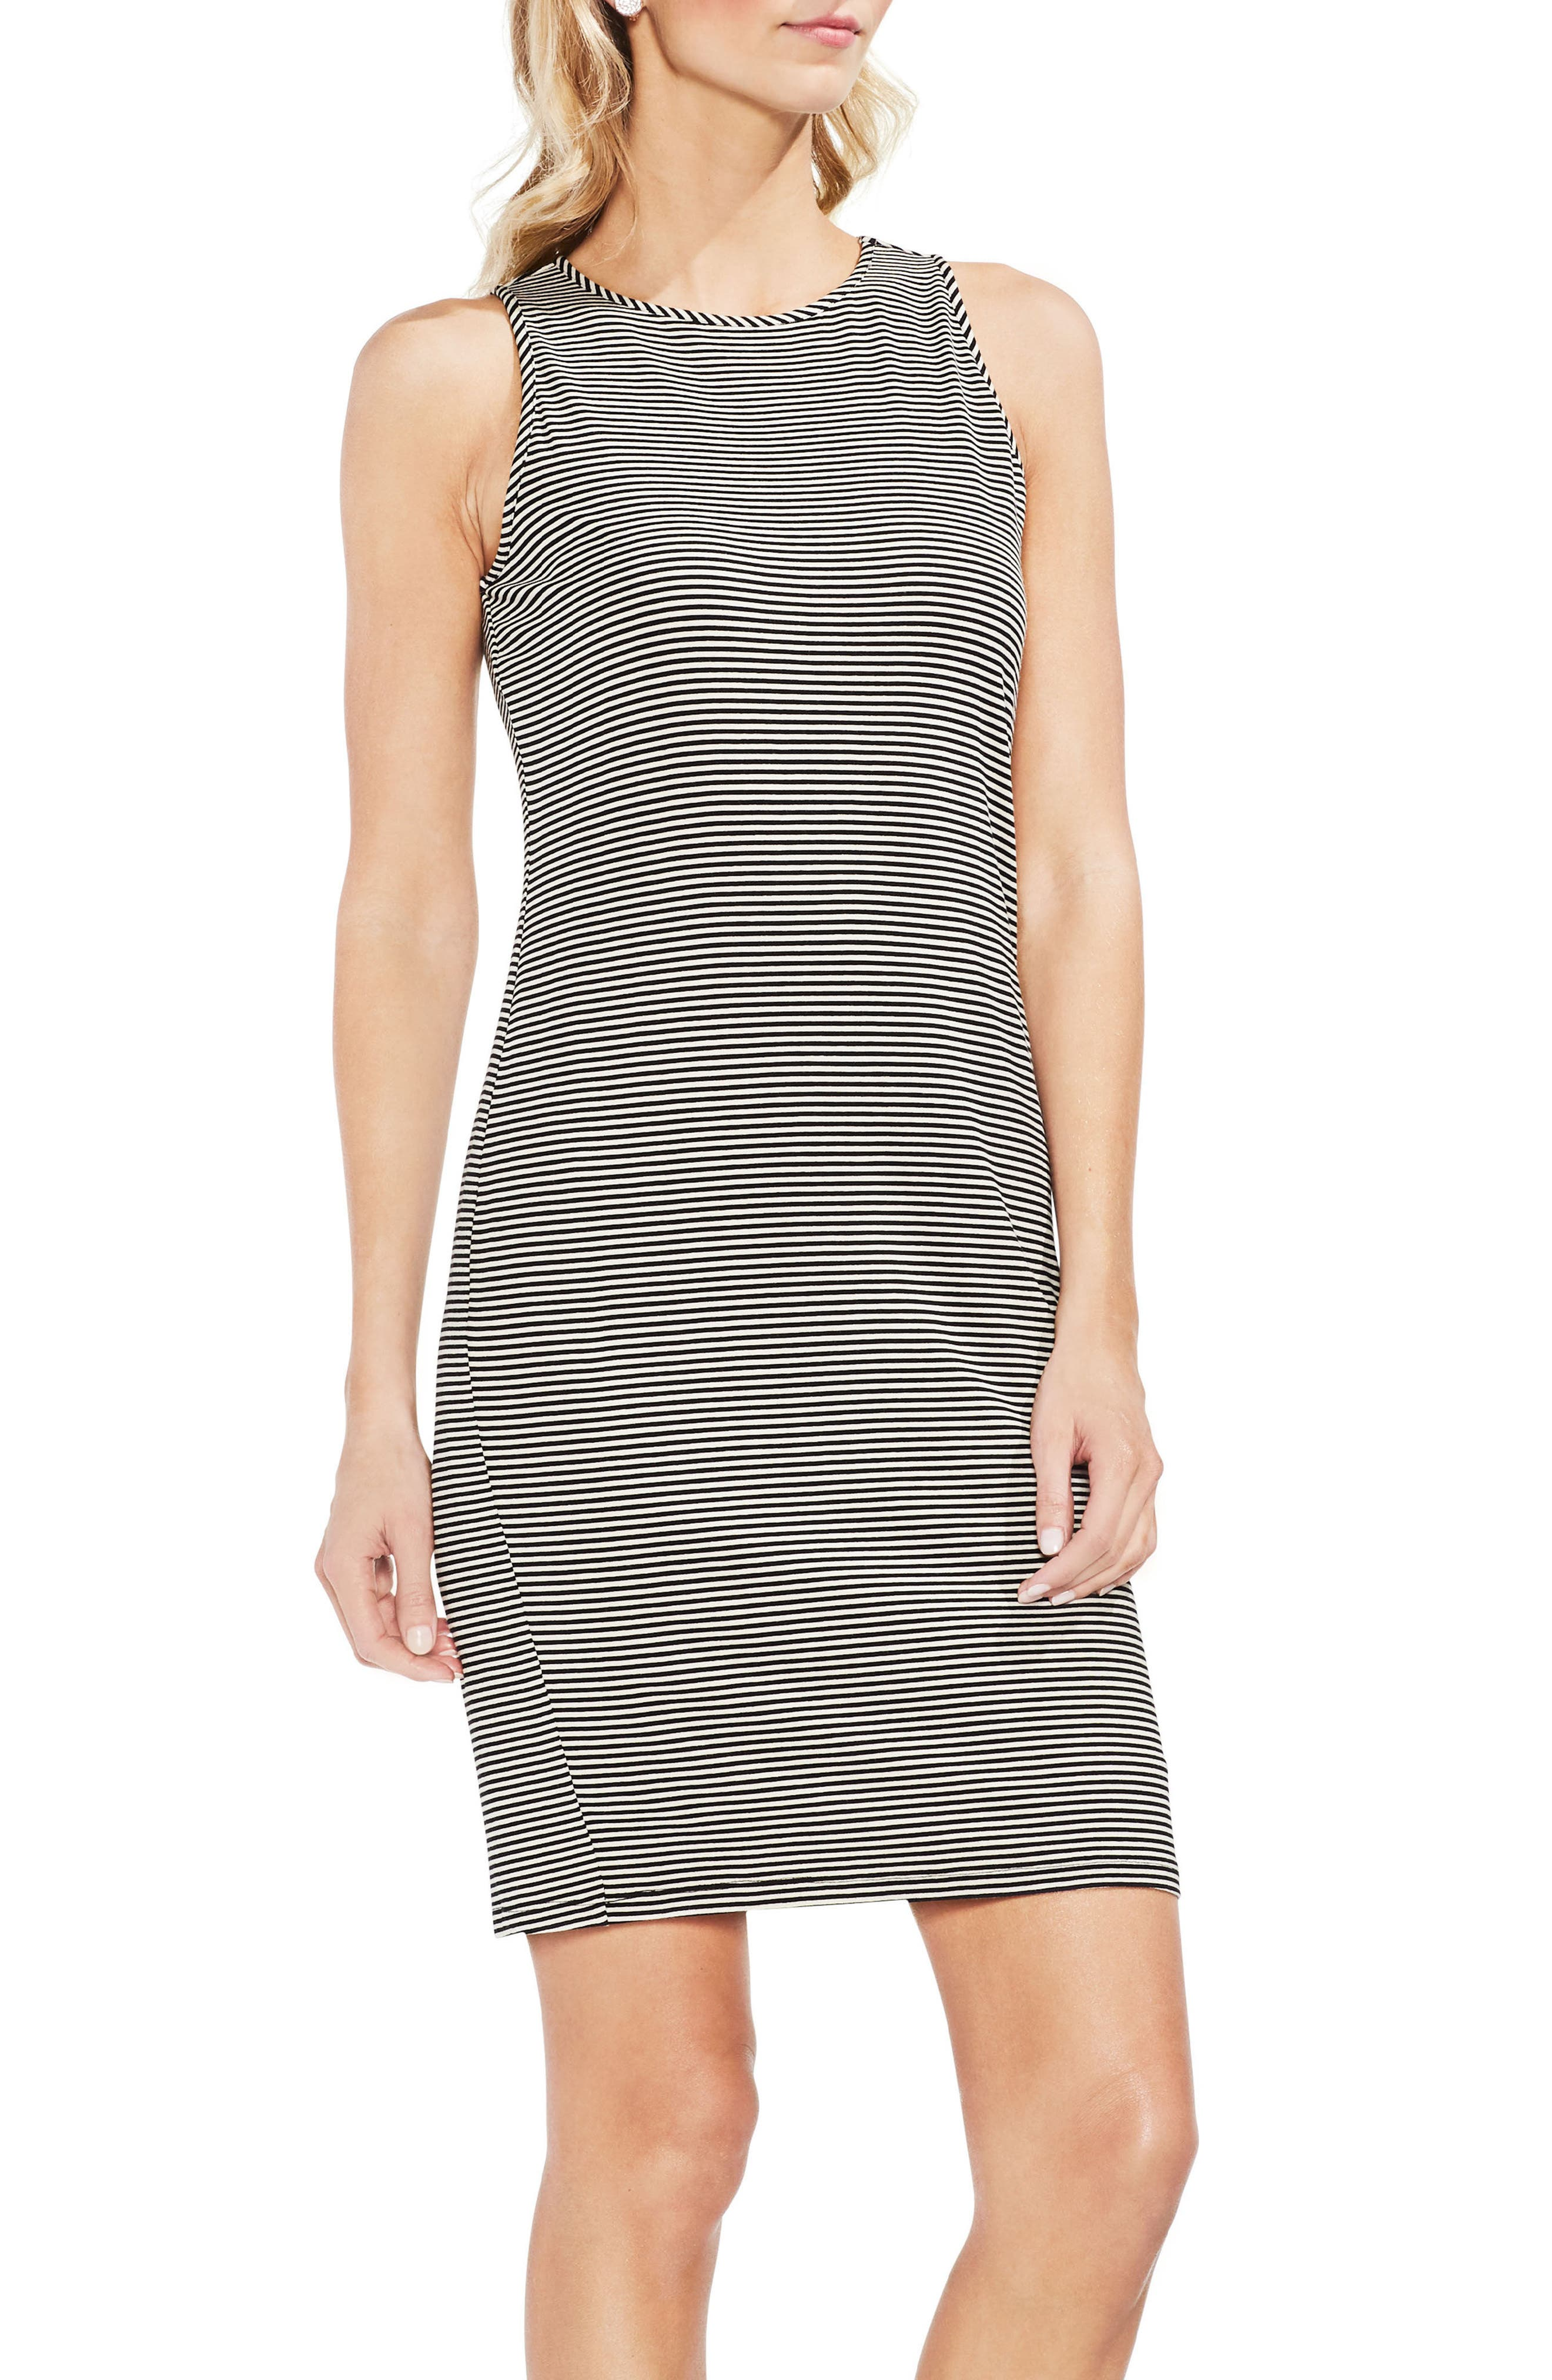 Chantelle Pinstripe Body-Con Dress,                         Main,                         color, 001